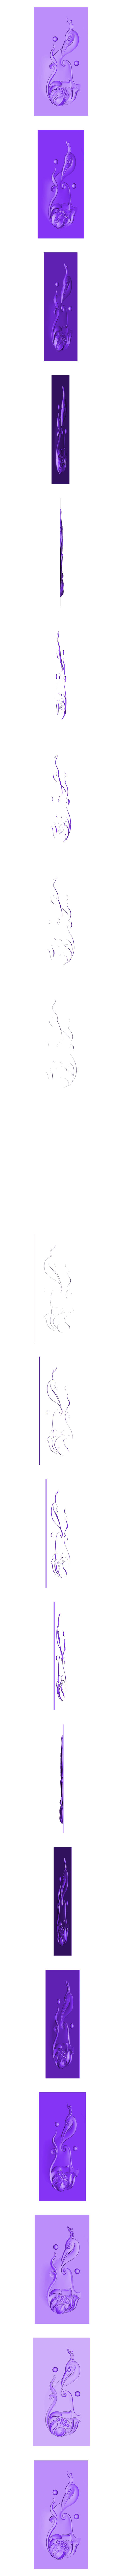 craneAndLotusZAZA.stl Download free STL file crane and lotus jade carving 3d model • 3D printing object, stlfilesfree